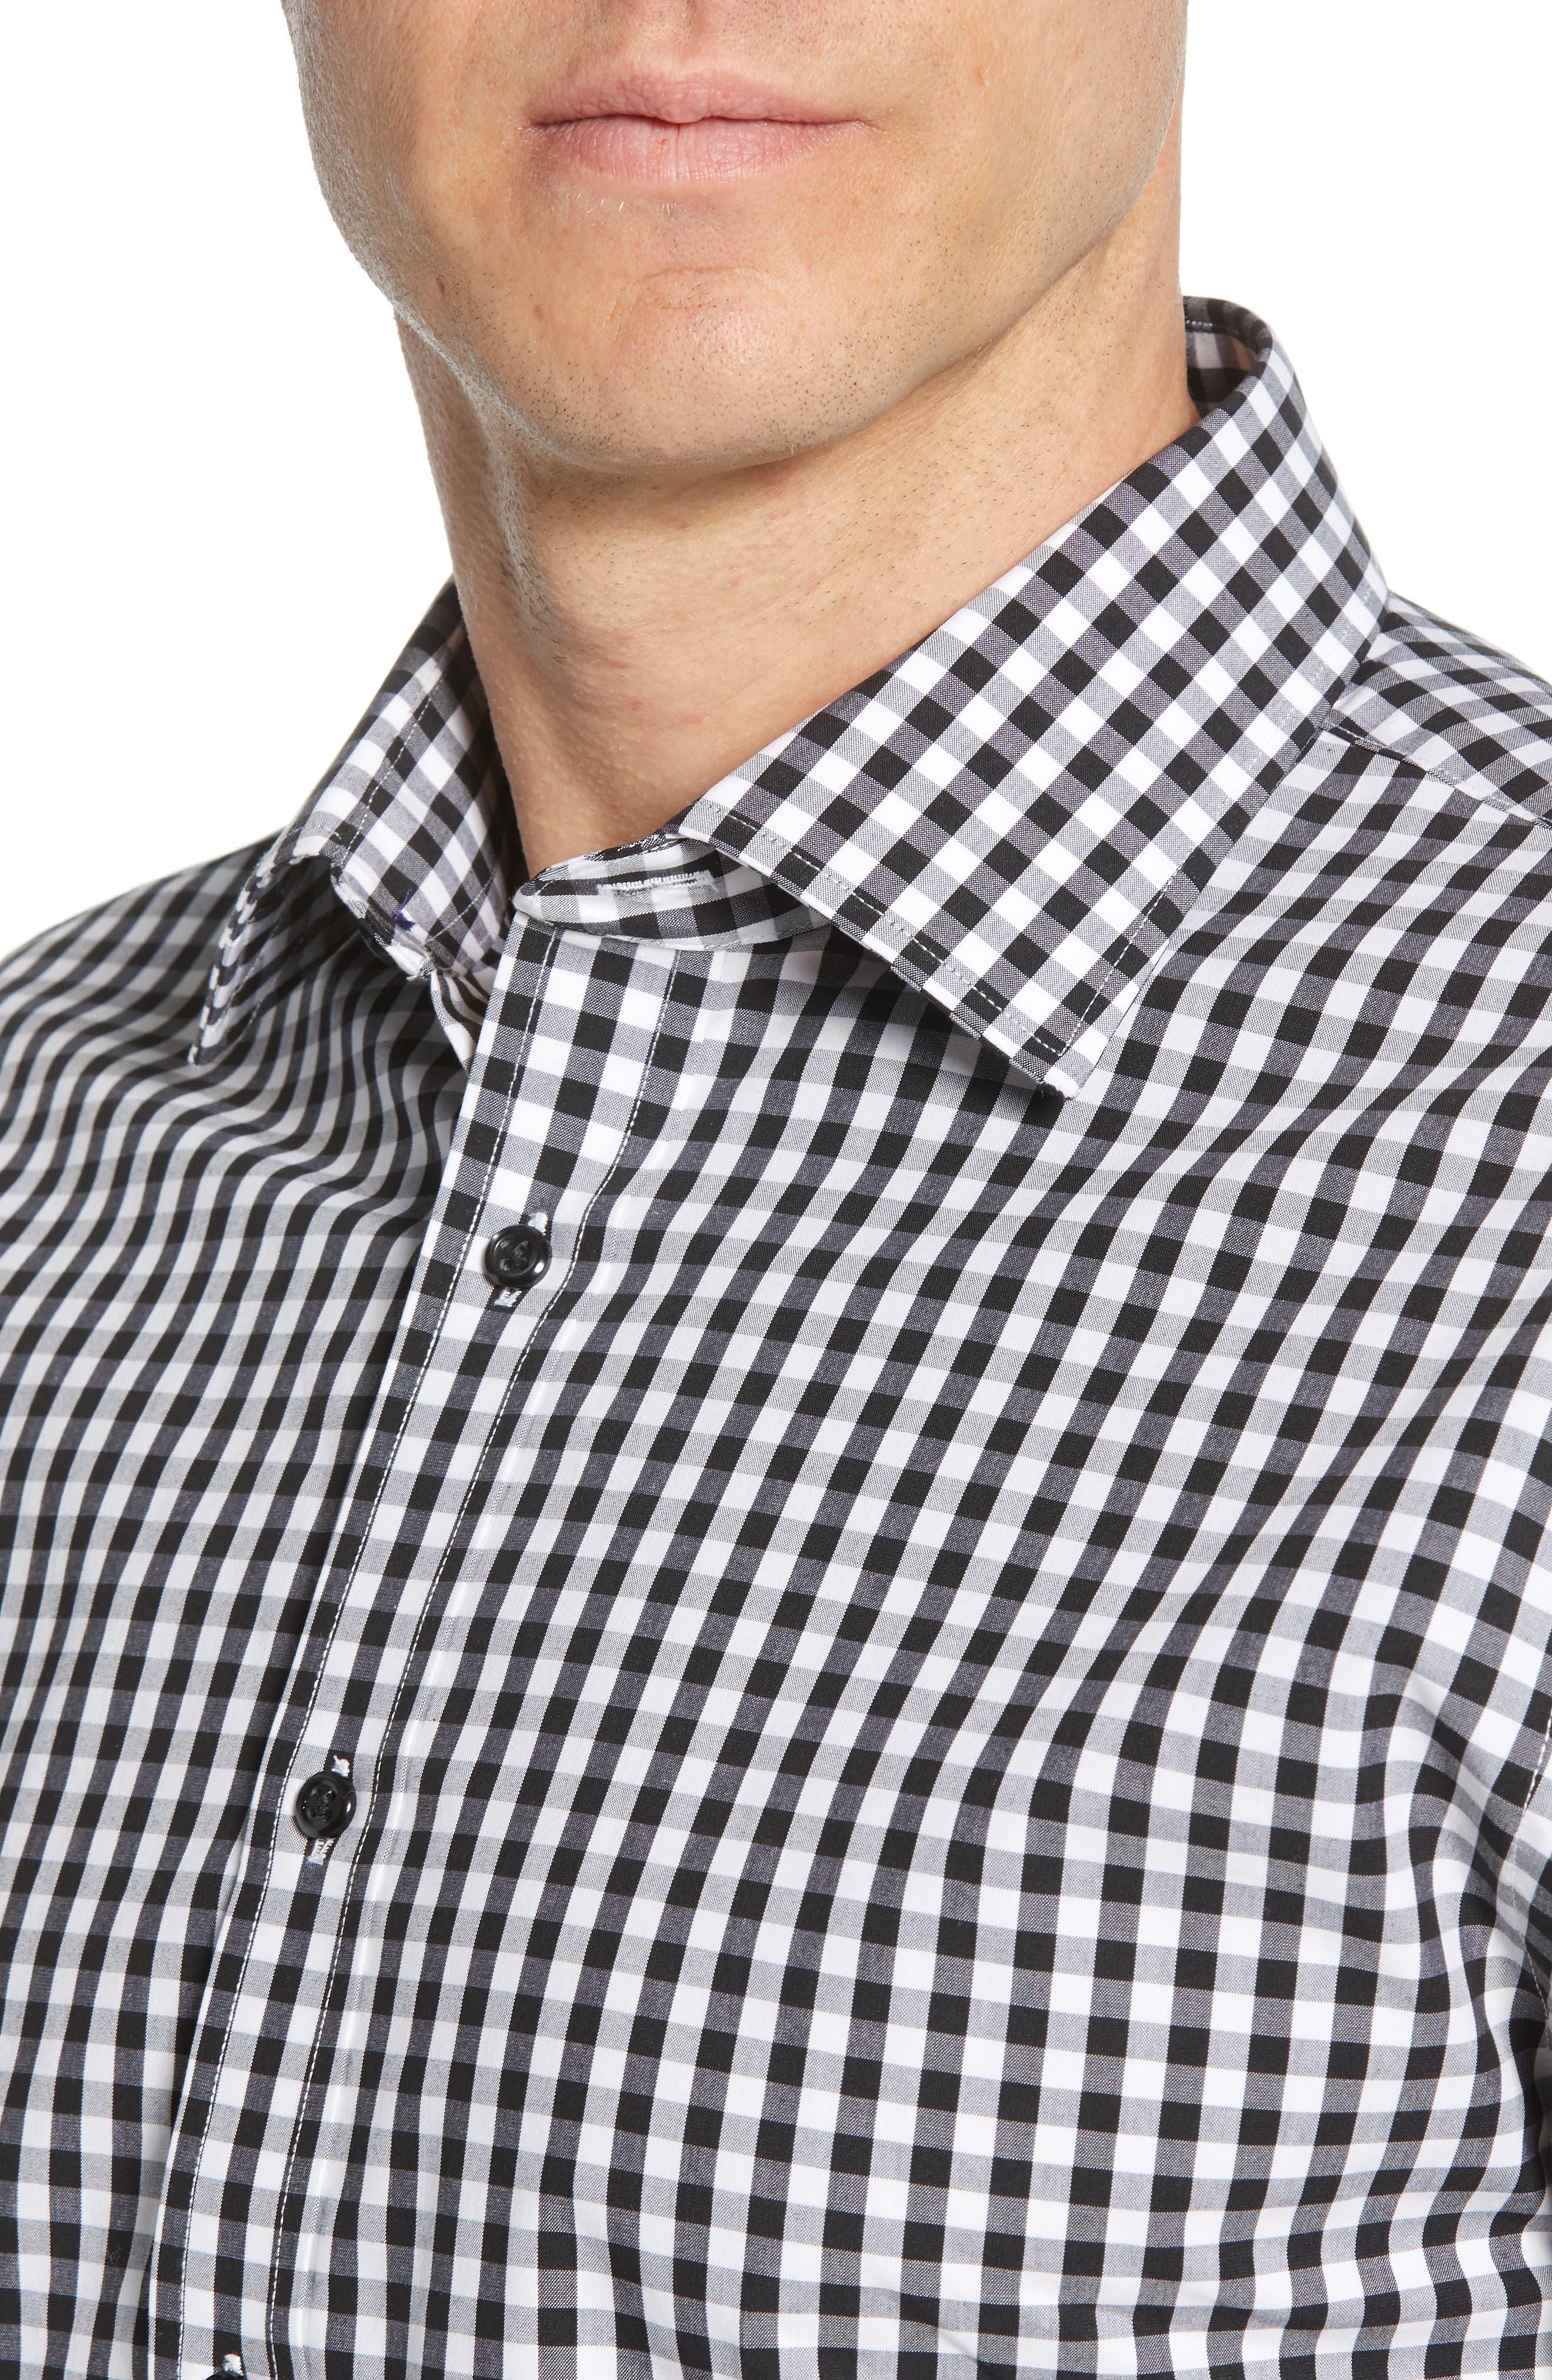 NORDSTROM MEN'S SHOP, Tech-Smart Traditional Fit Stretch Check Dress Shirt, Alternate thumbnail 2, color, BLACK ROCK